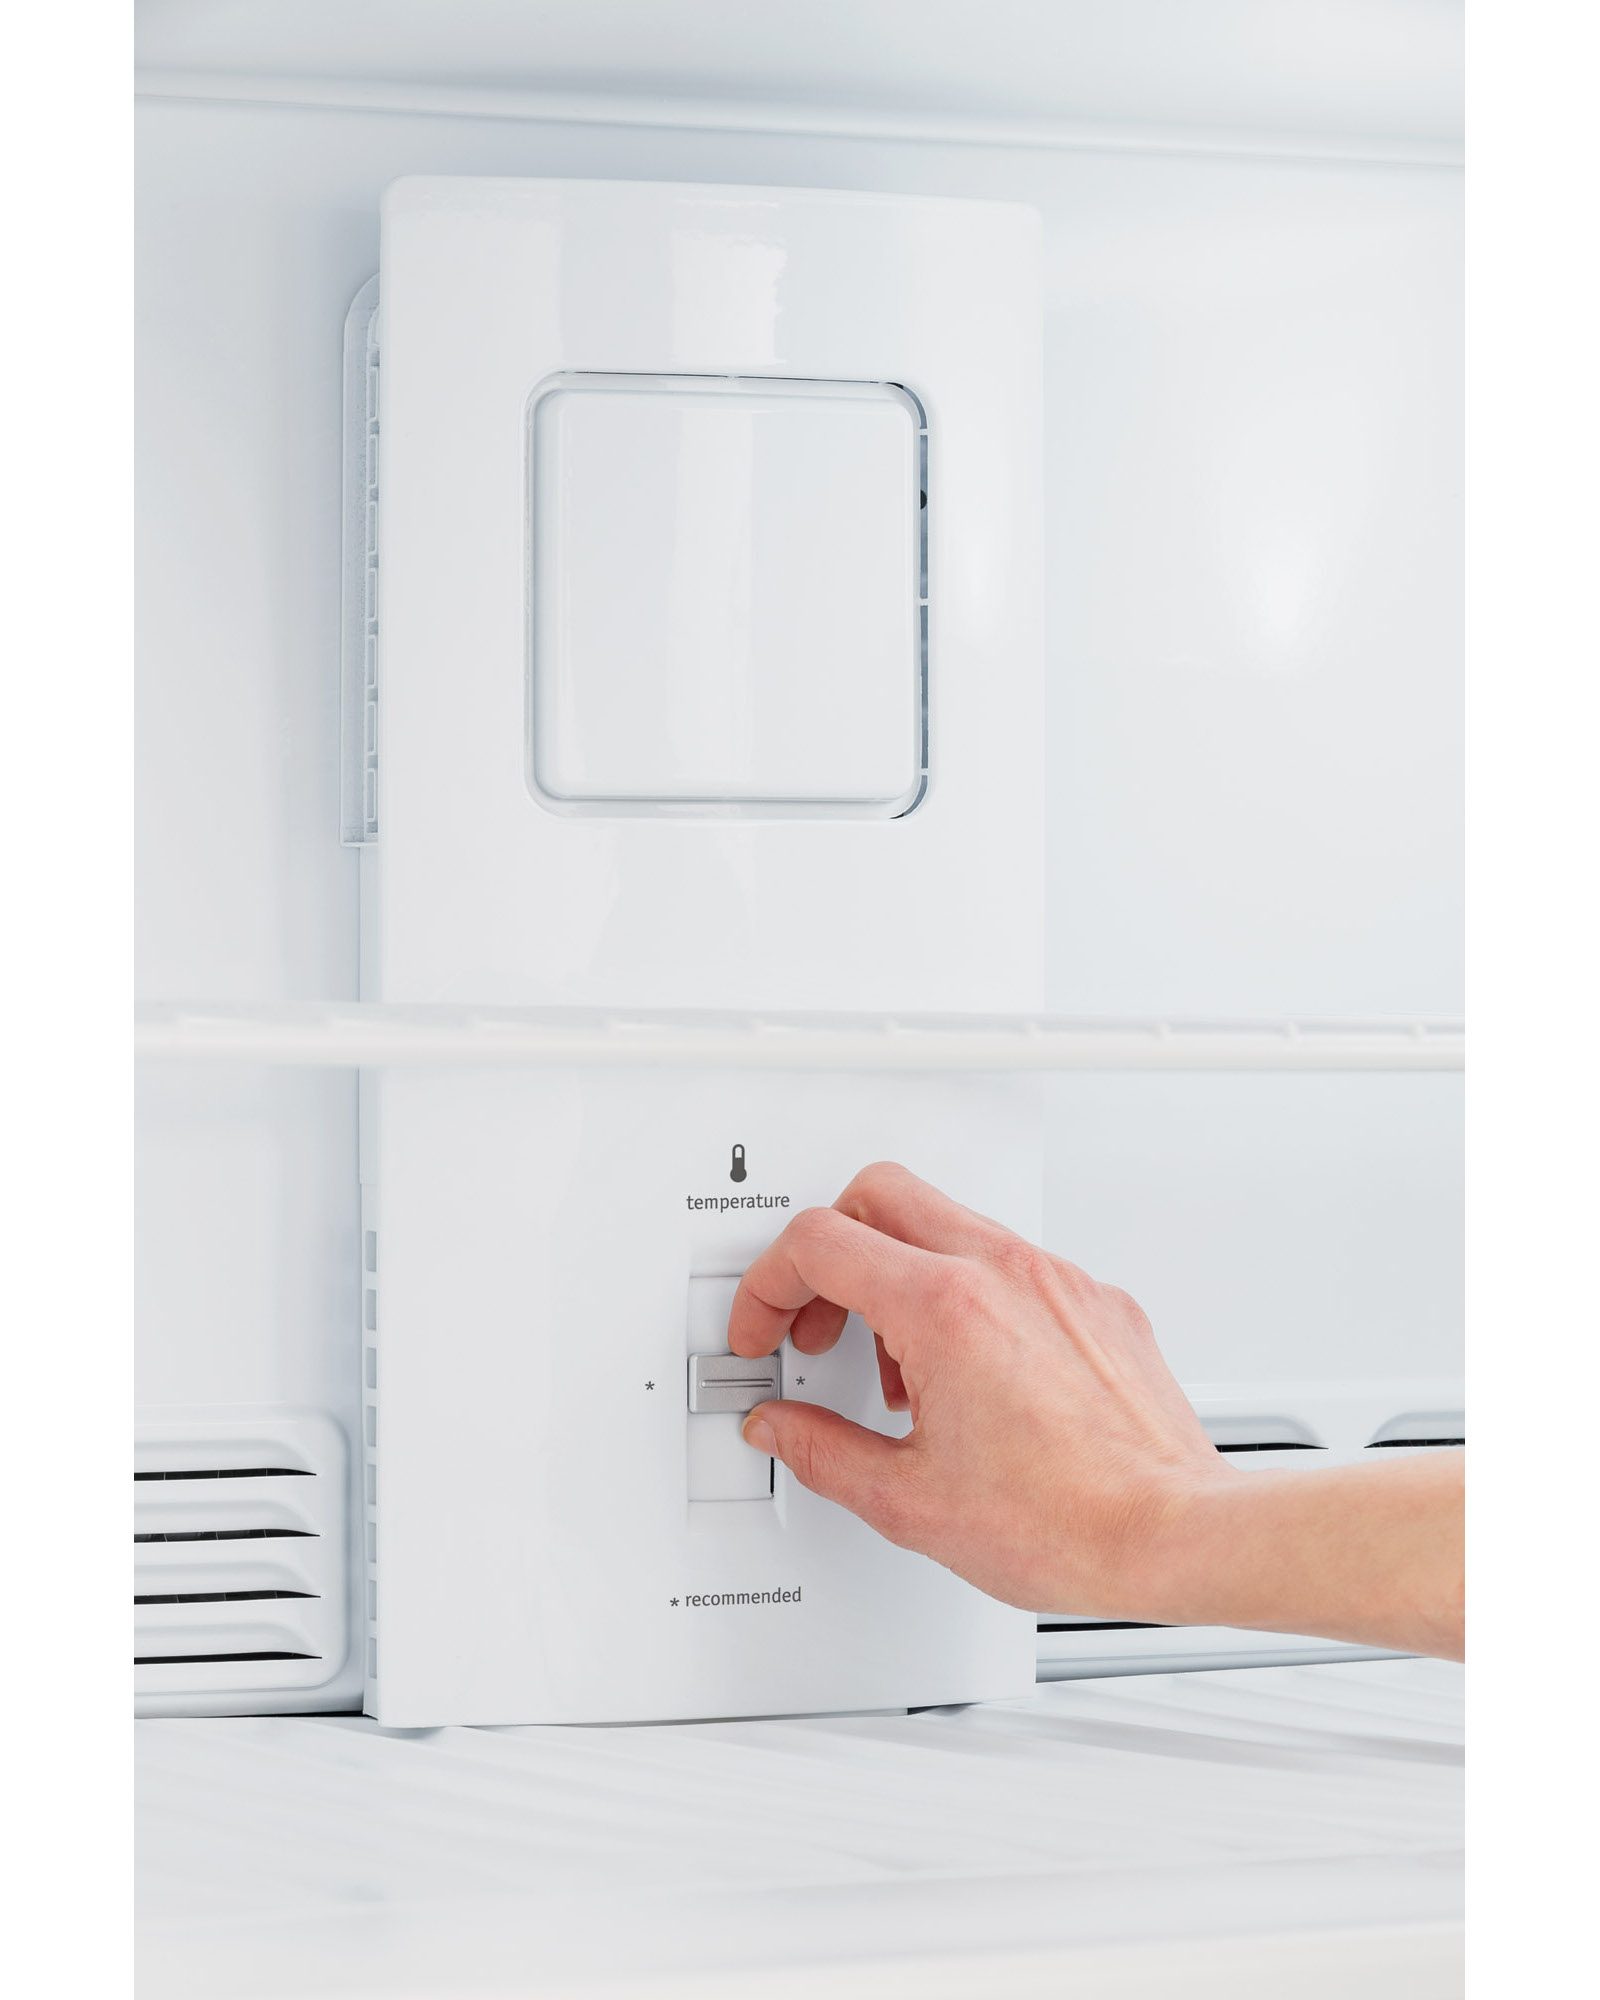 Frigidaire 14.5 cu. ft. Top-Mount Refrigerator - White